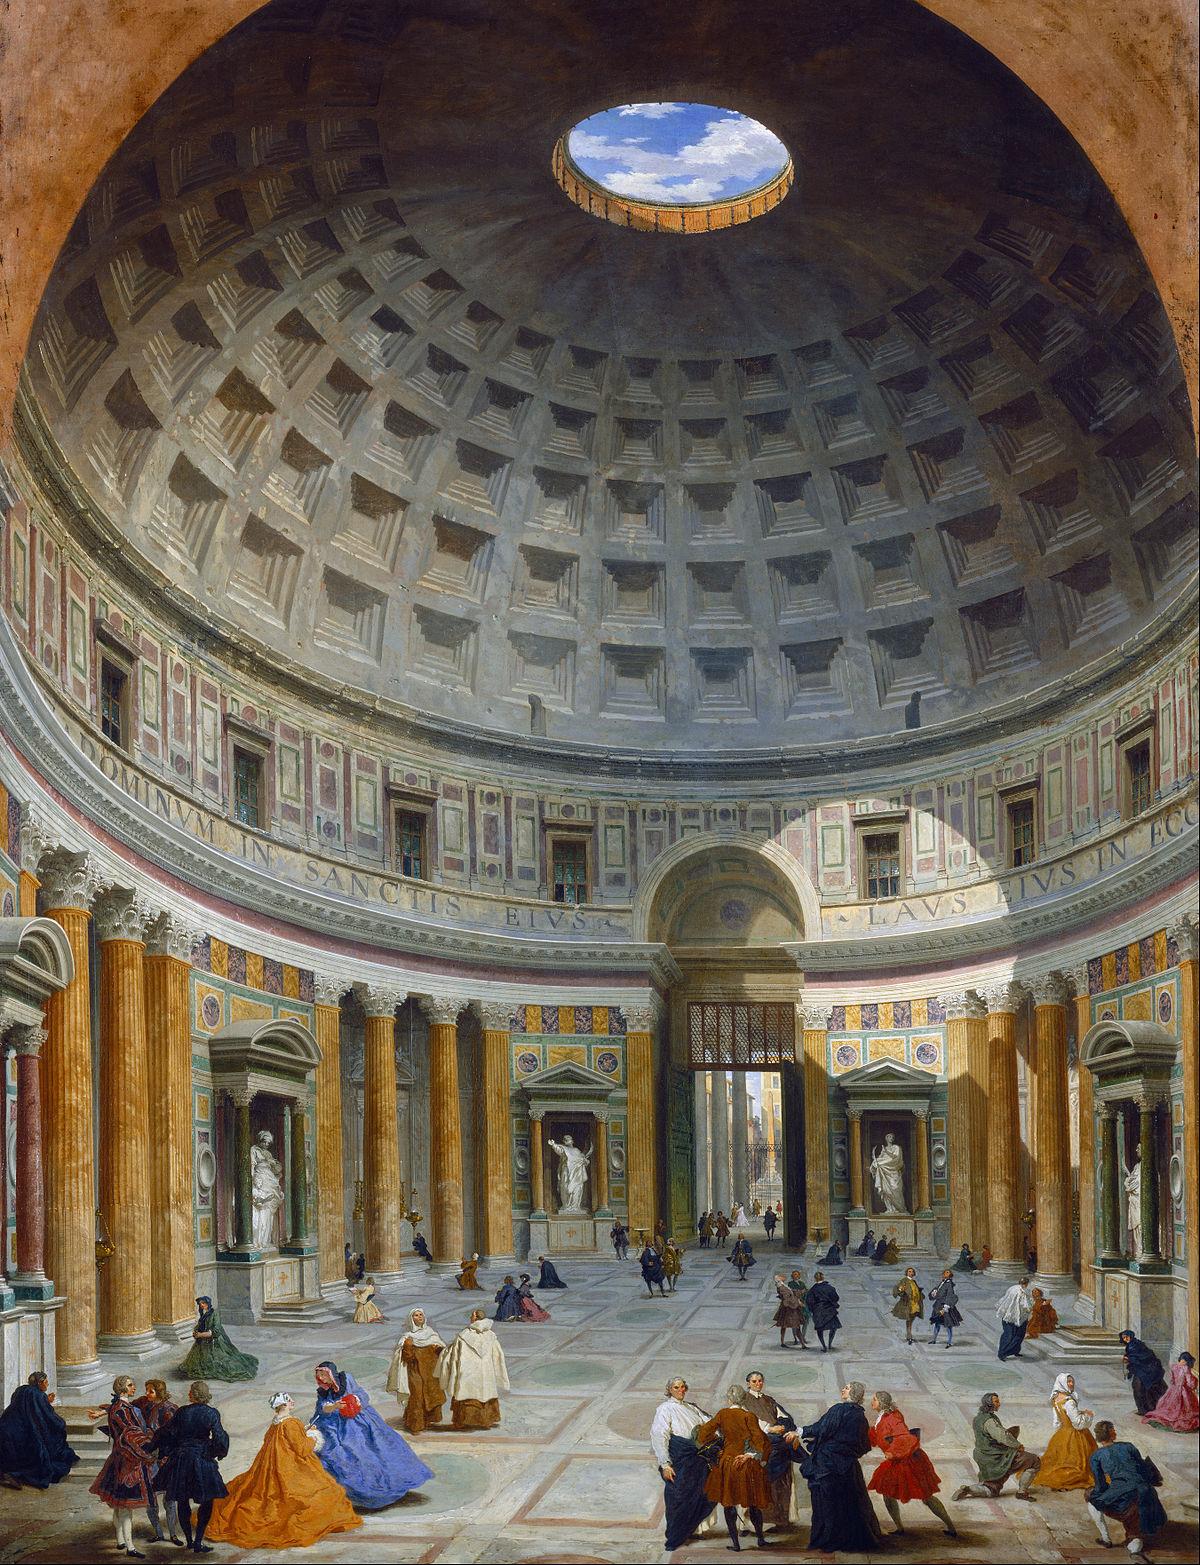 Пантеон в Риме. Giovanni Paolo Panini - Interior of the Pantheon, Rome - Google Art Project.jpg